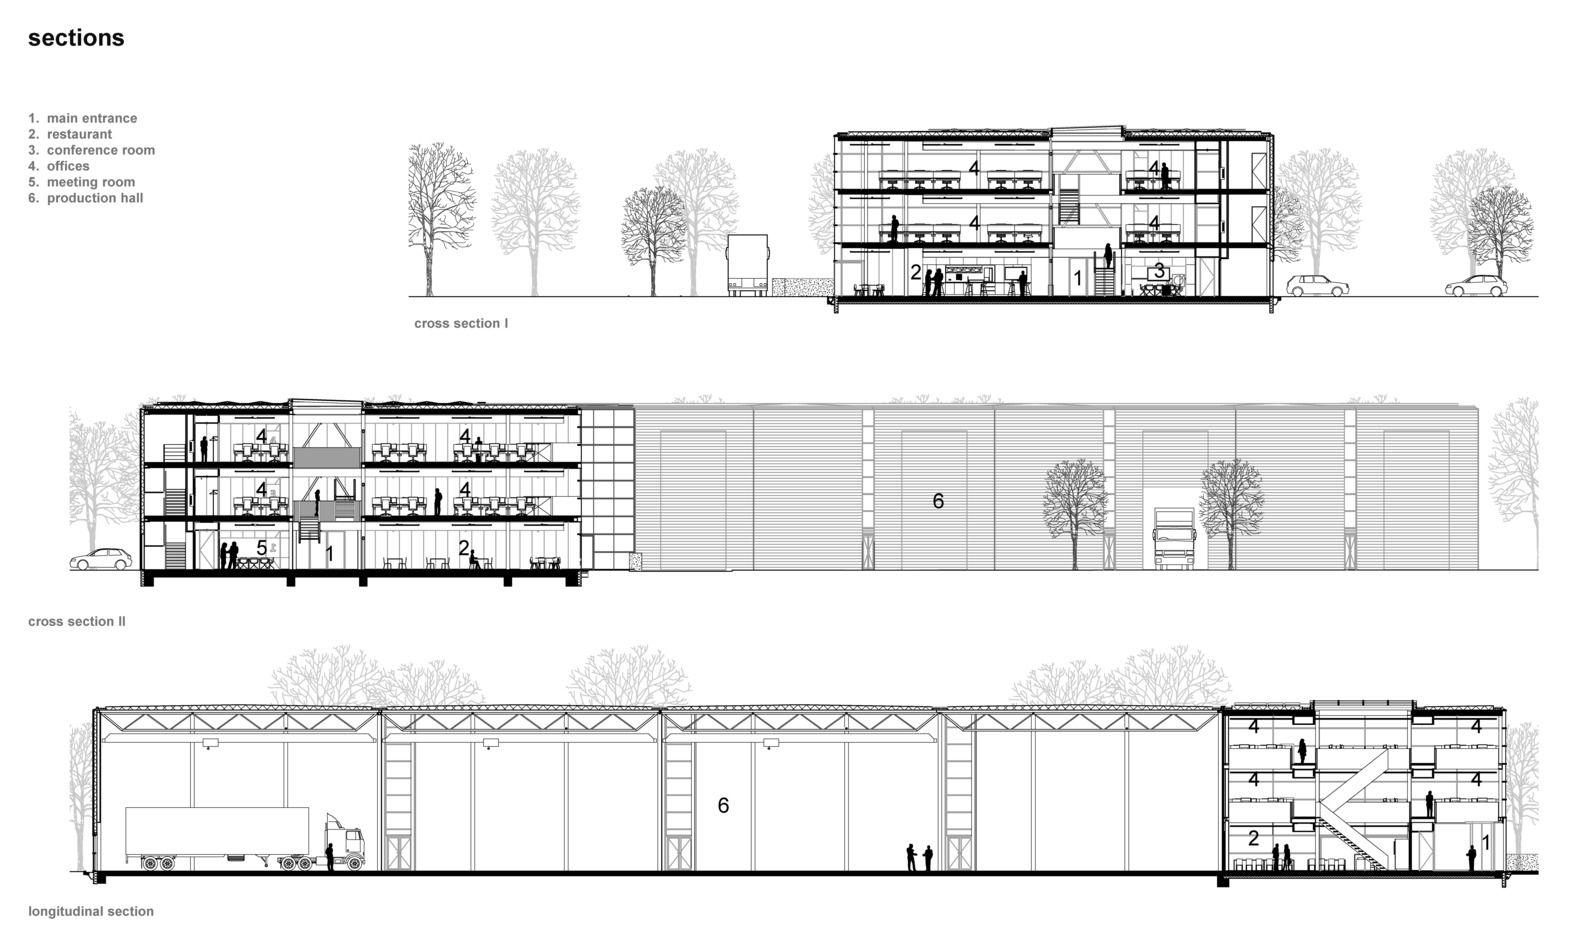 Gallery Of Lan Handling Technologies Office Building Cepezed 21 Office Building Building Building Section